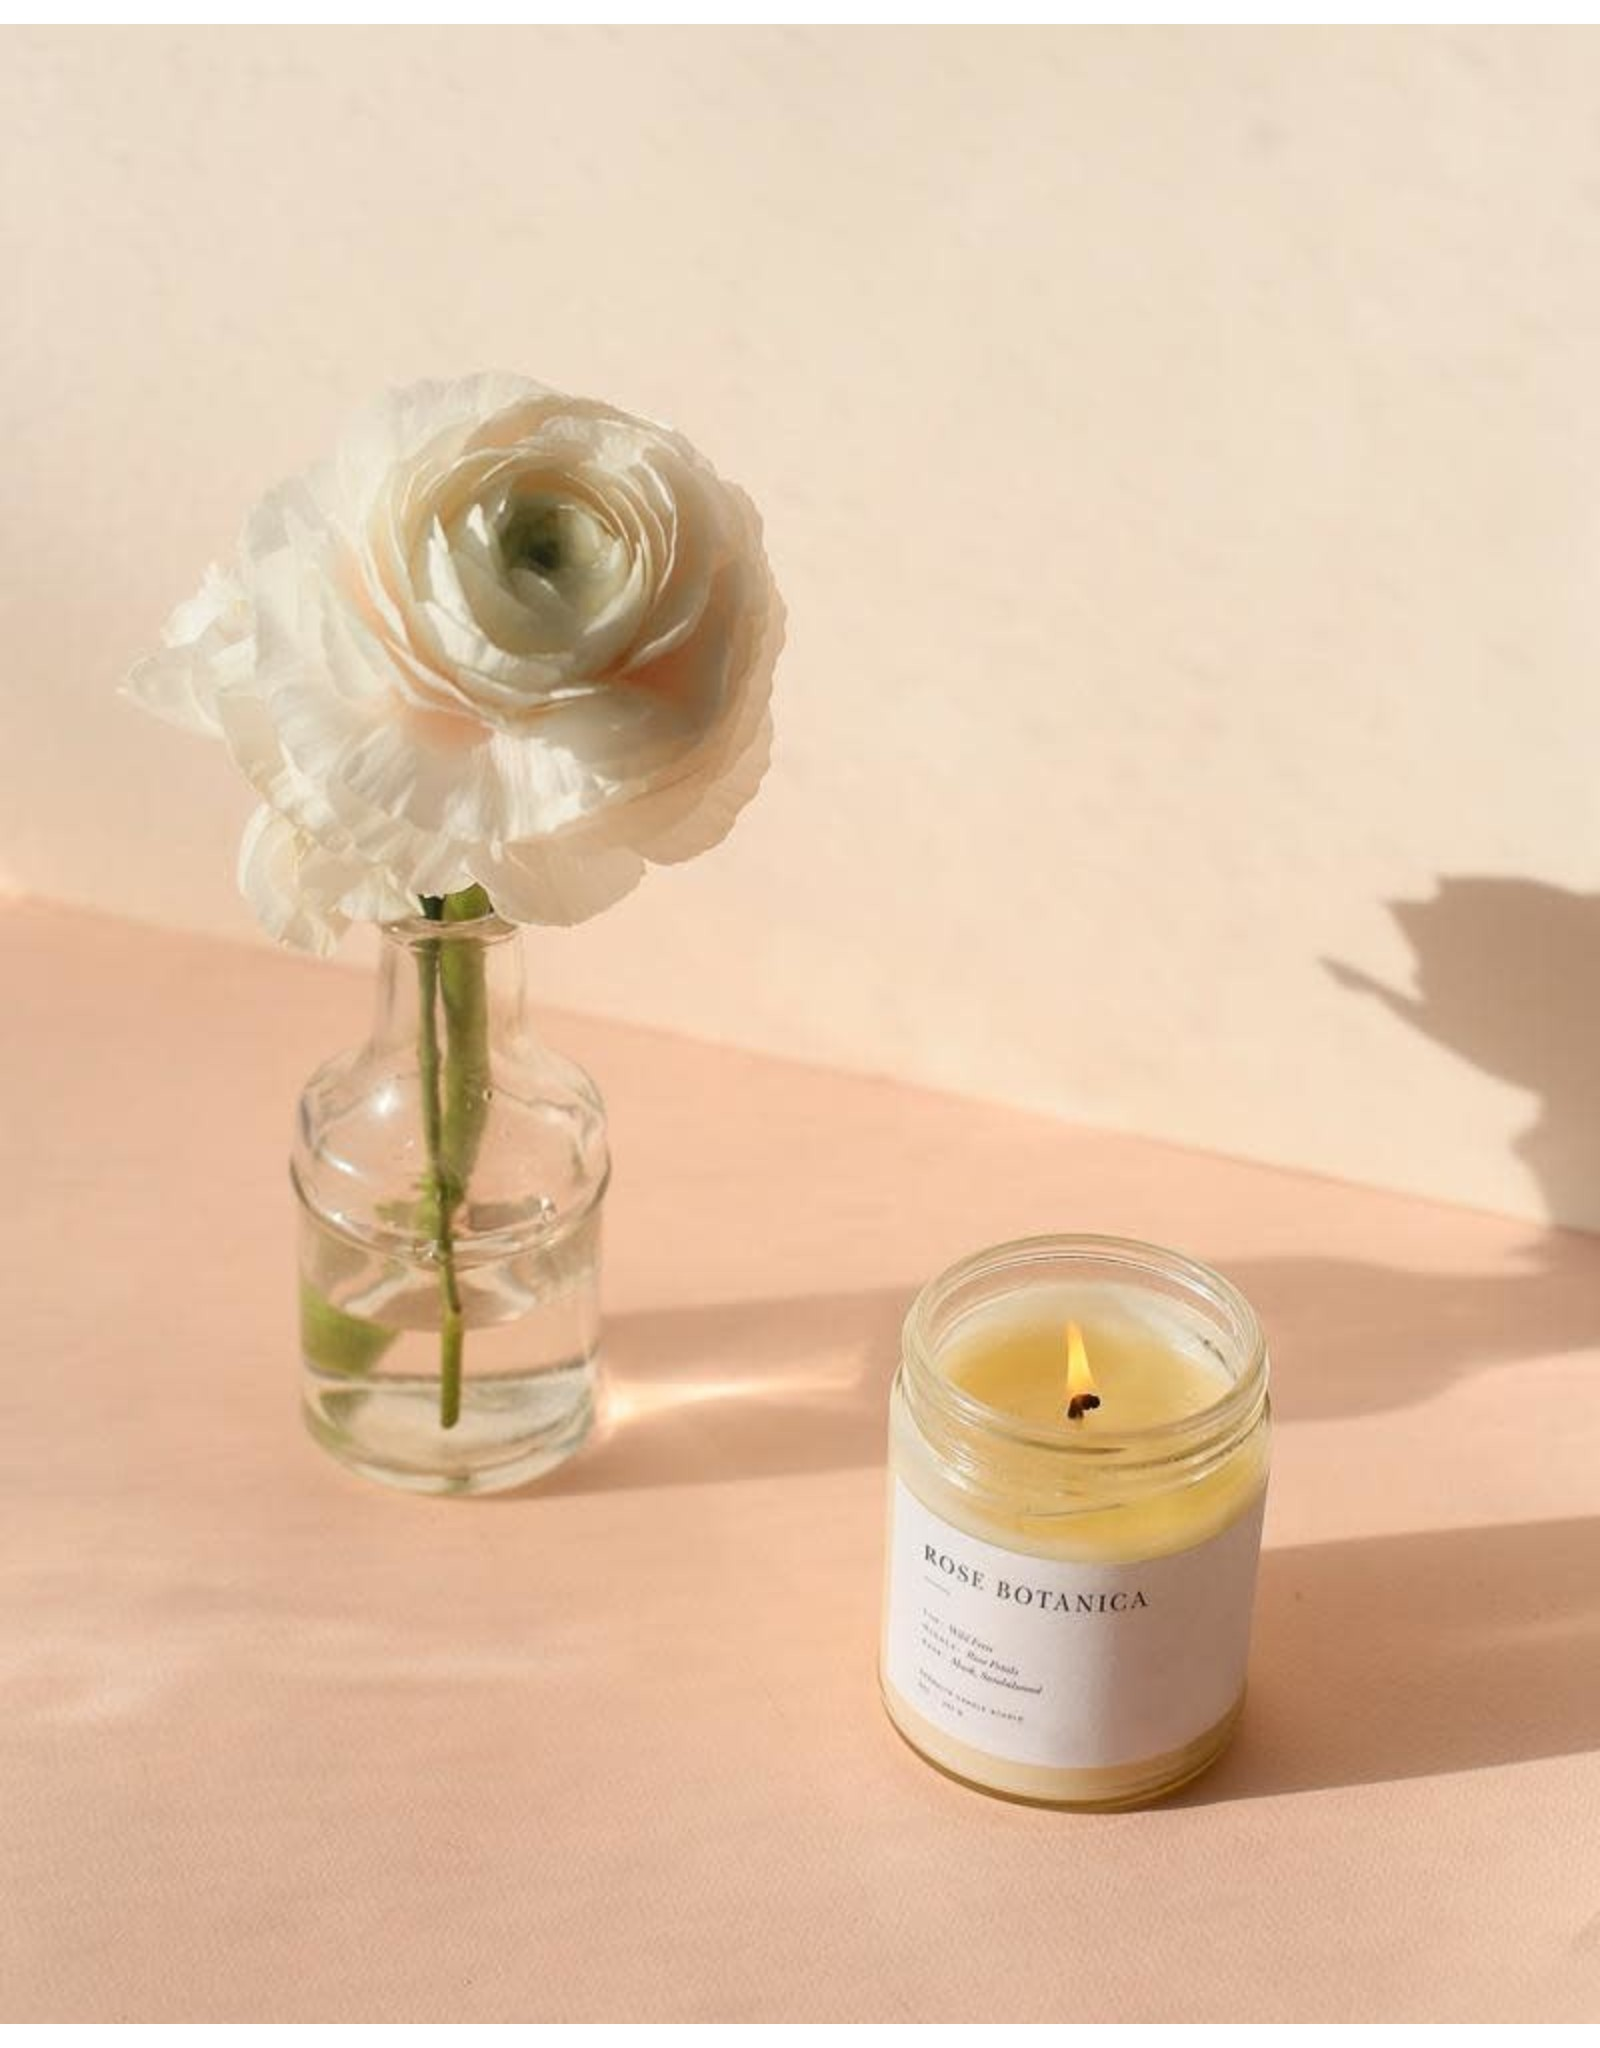 Brooklyn Candle Studio Rose Botanica - Minimalist Jar Candle - Brooklyn Candle Studio